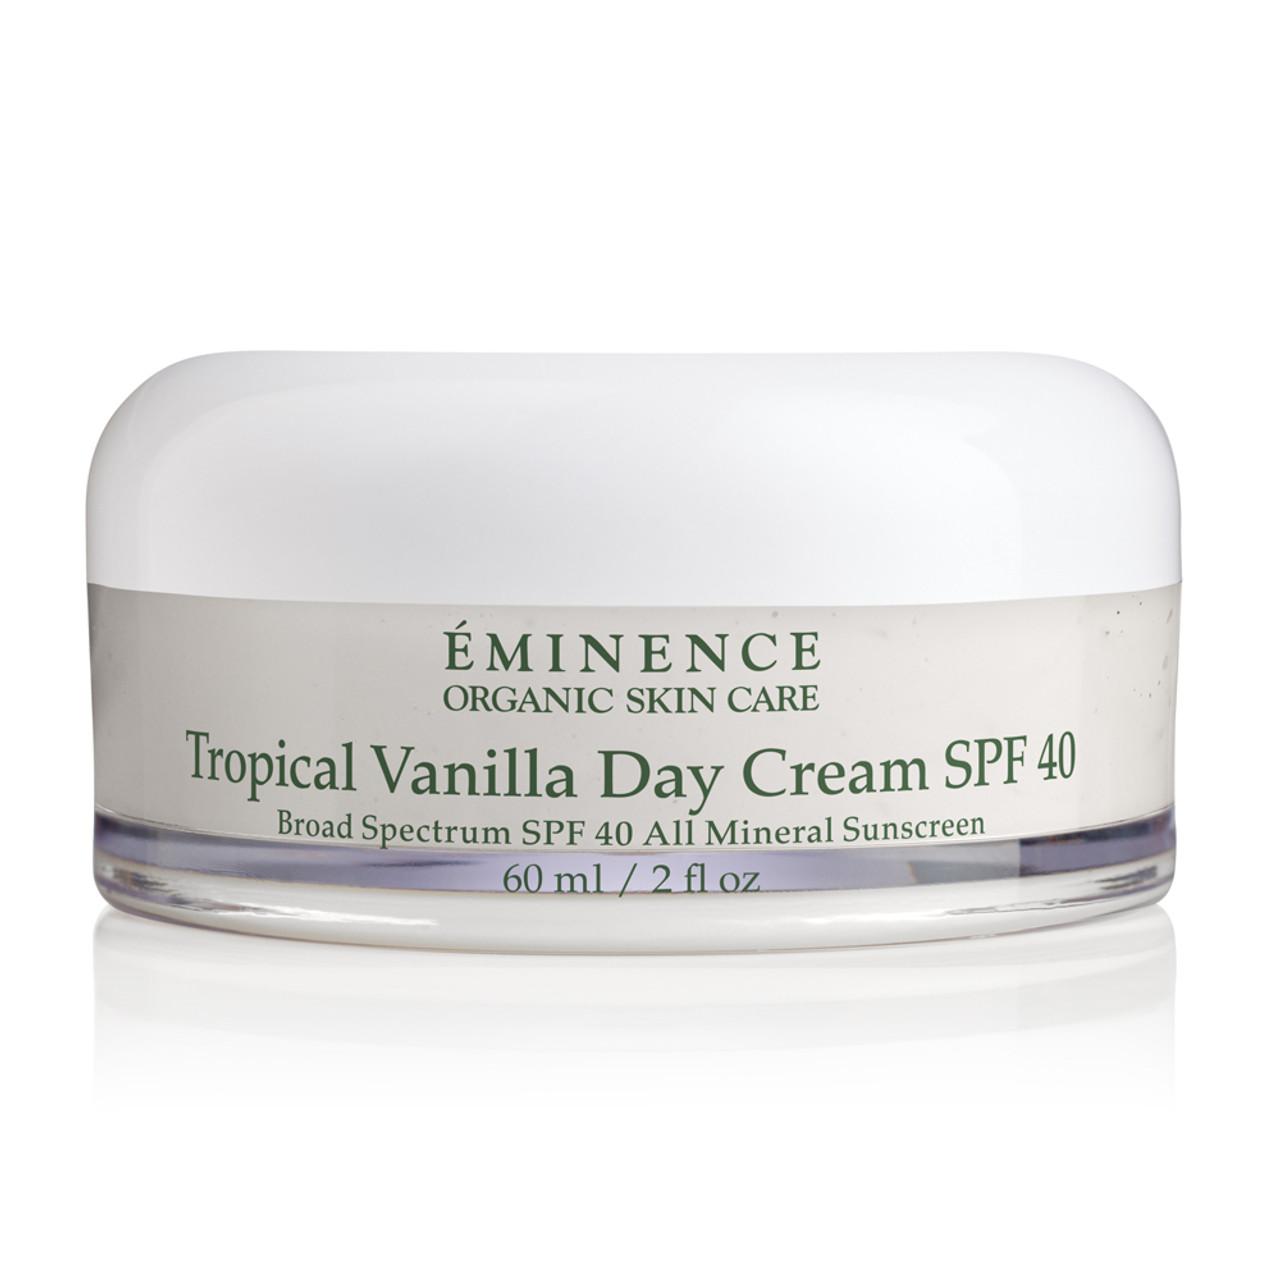 Eminence Tropical Vanilla Day Cream SPF 40 BeautifiedYou.com